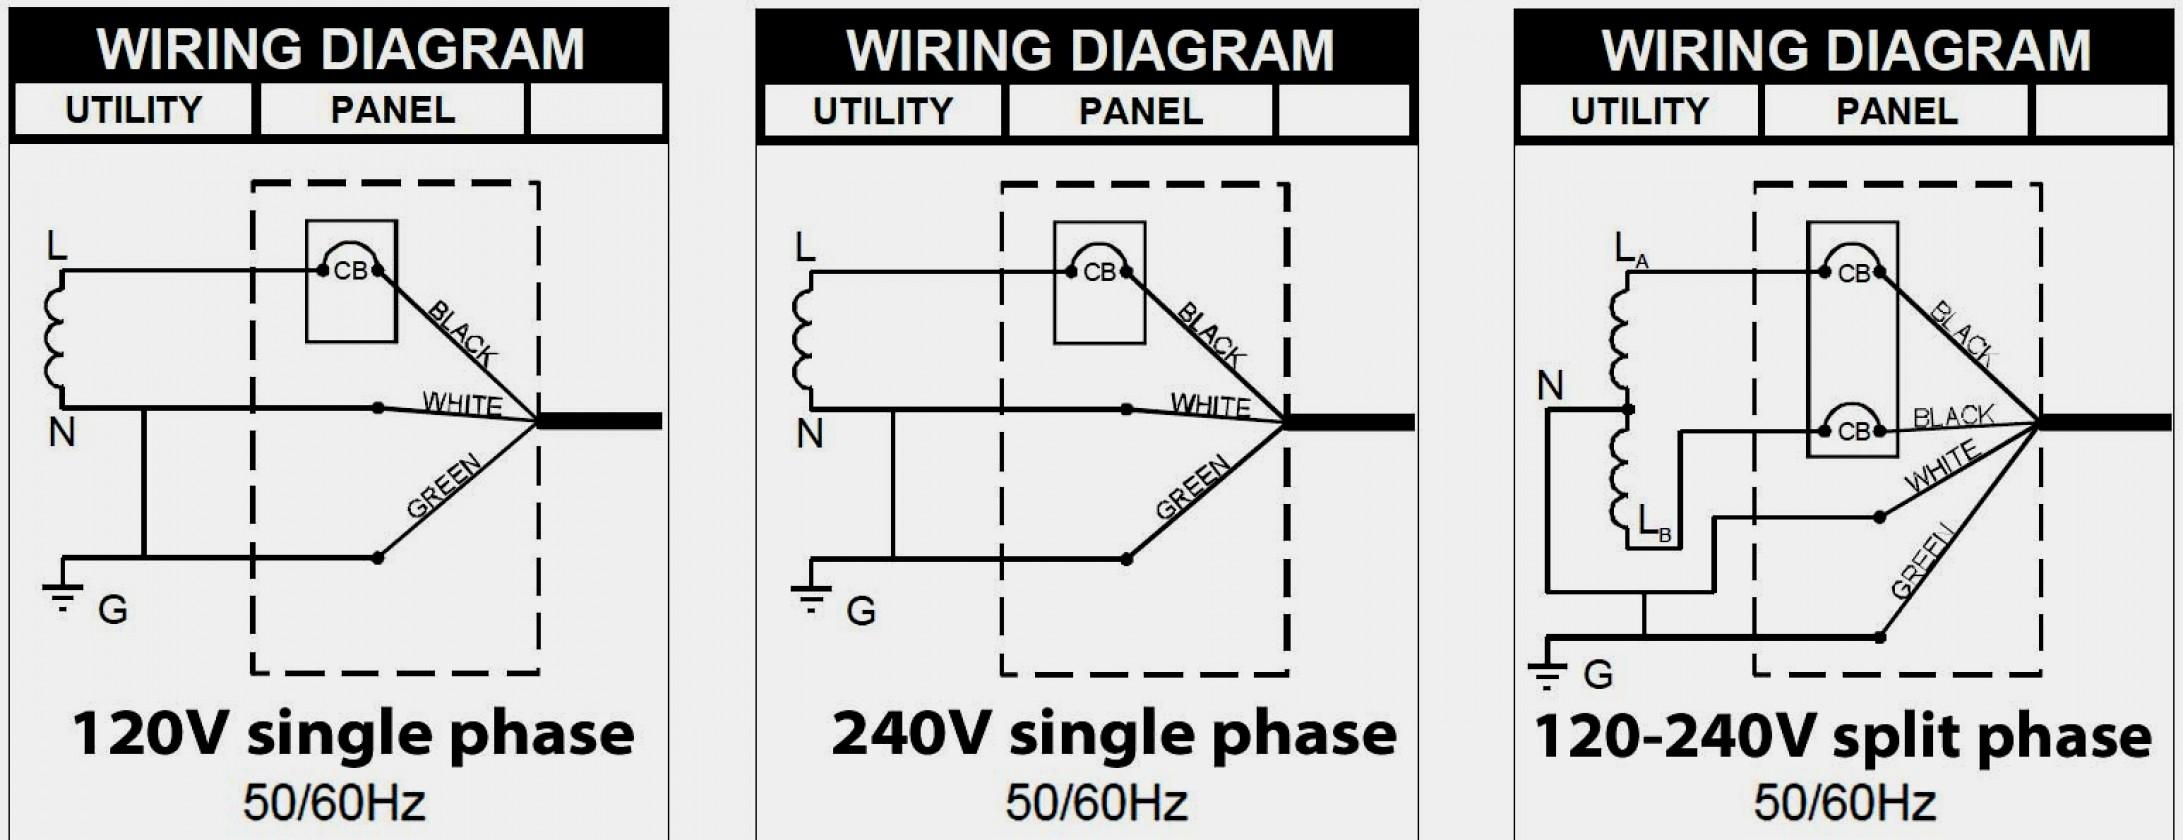 208V Single Phase Wiring Diagram 208 Volt In Wellread Me - Wiring Diagram For 230V Single Phase Motor